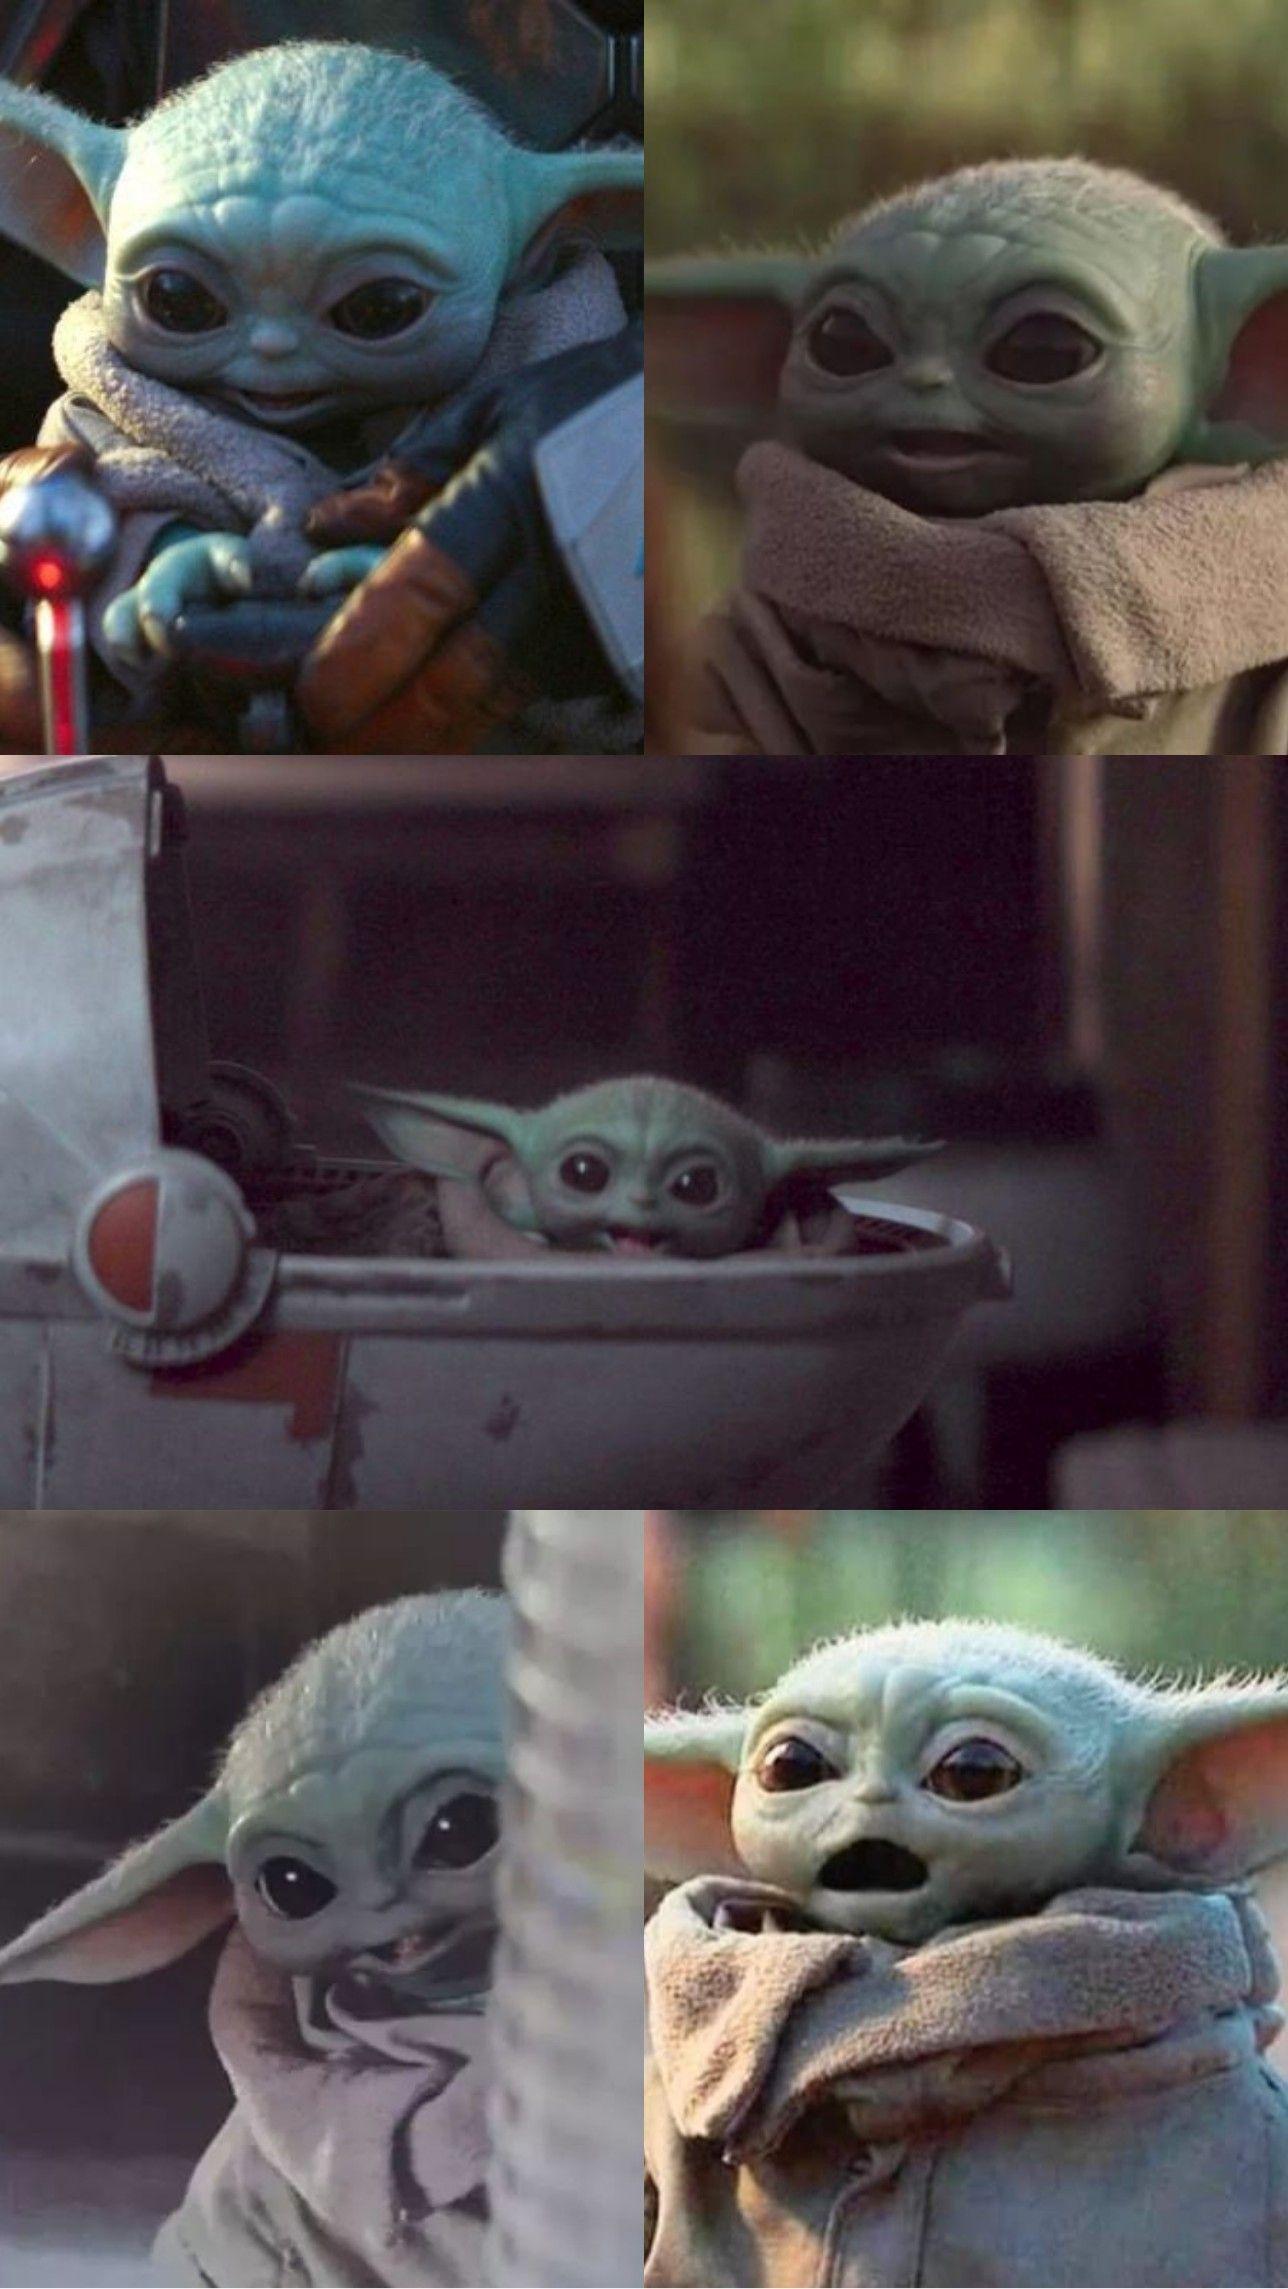 Baby Yoda Wallpaper Yoda Wallpaper Star Wars Baby Yoda Images